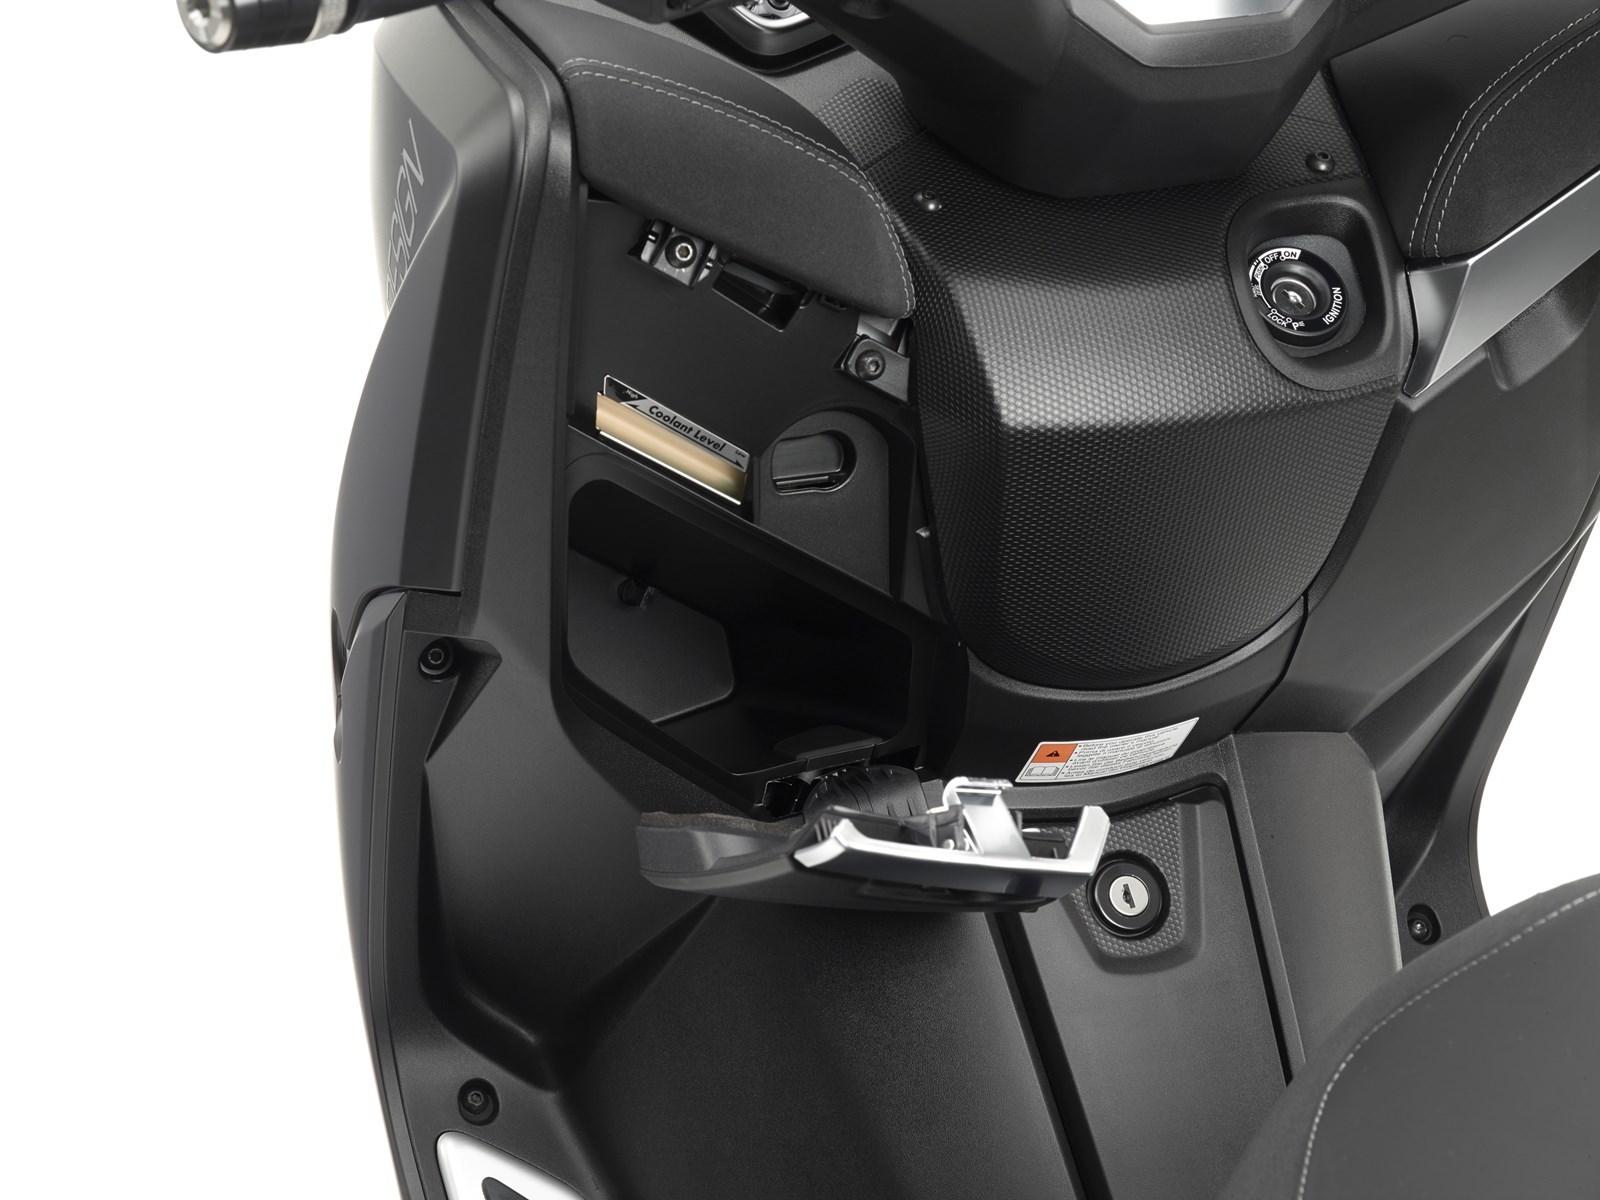 Foto de Yamaha X-MAX 400 MOMODESIGN, estudio y detalles (20/33)